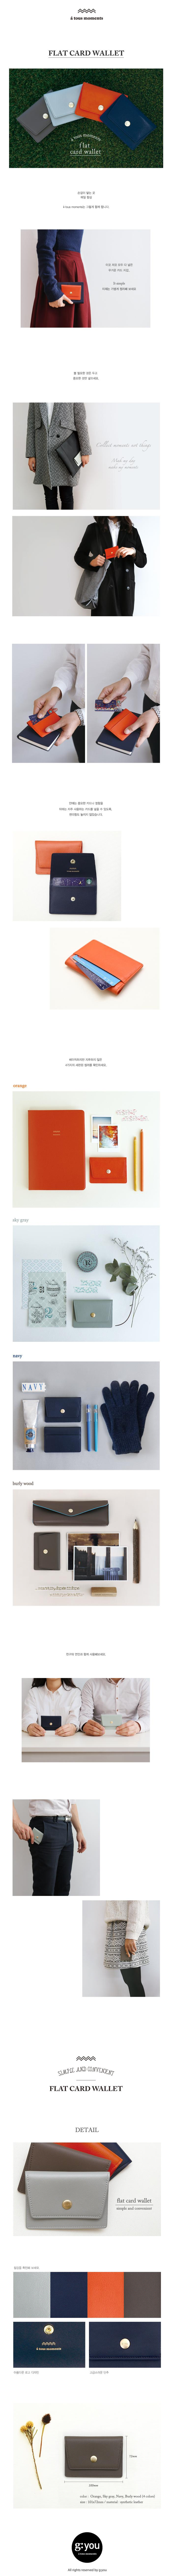 FLAT CARD WALLET - 지유, 14,800원, 동전/카드지갑, 카드지갑